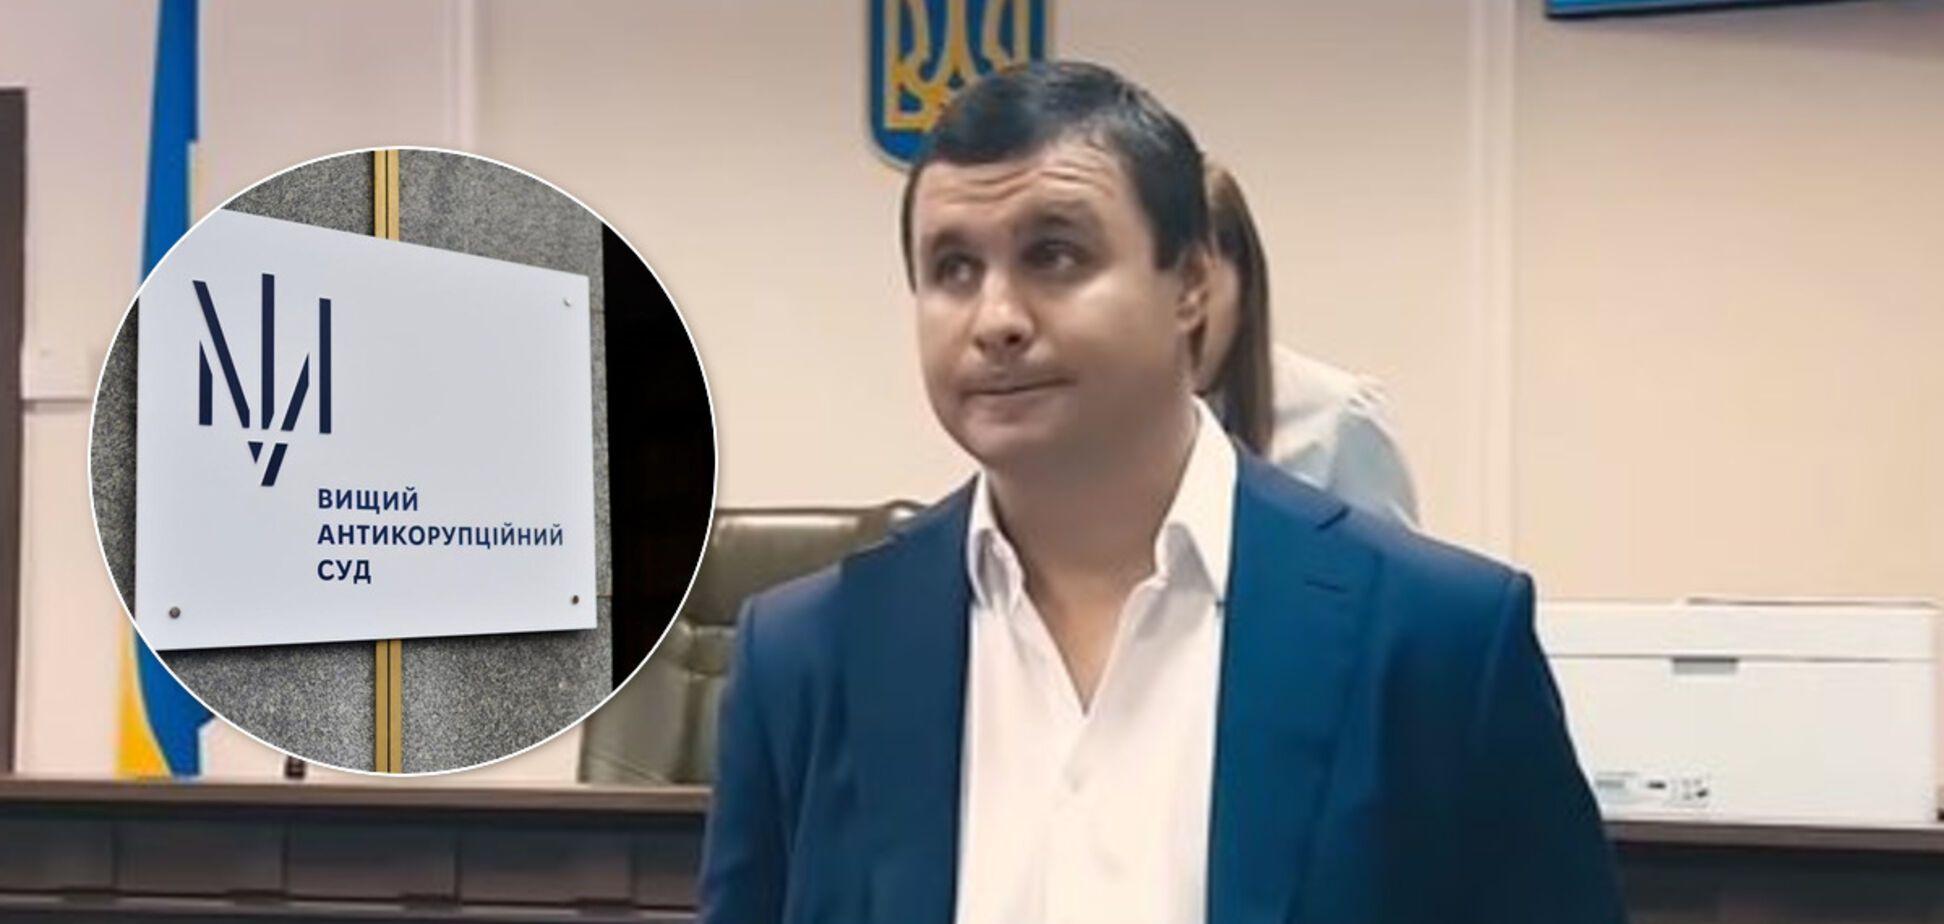 Суд взыскал с экс-нардепа Микитася рекордную сумму залога в 30 млн грн